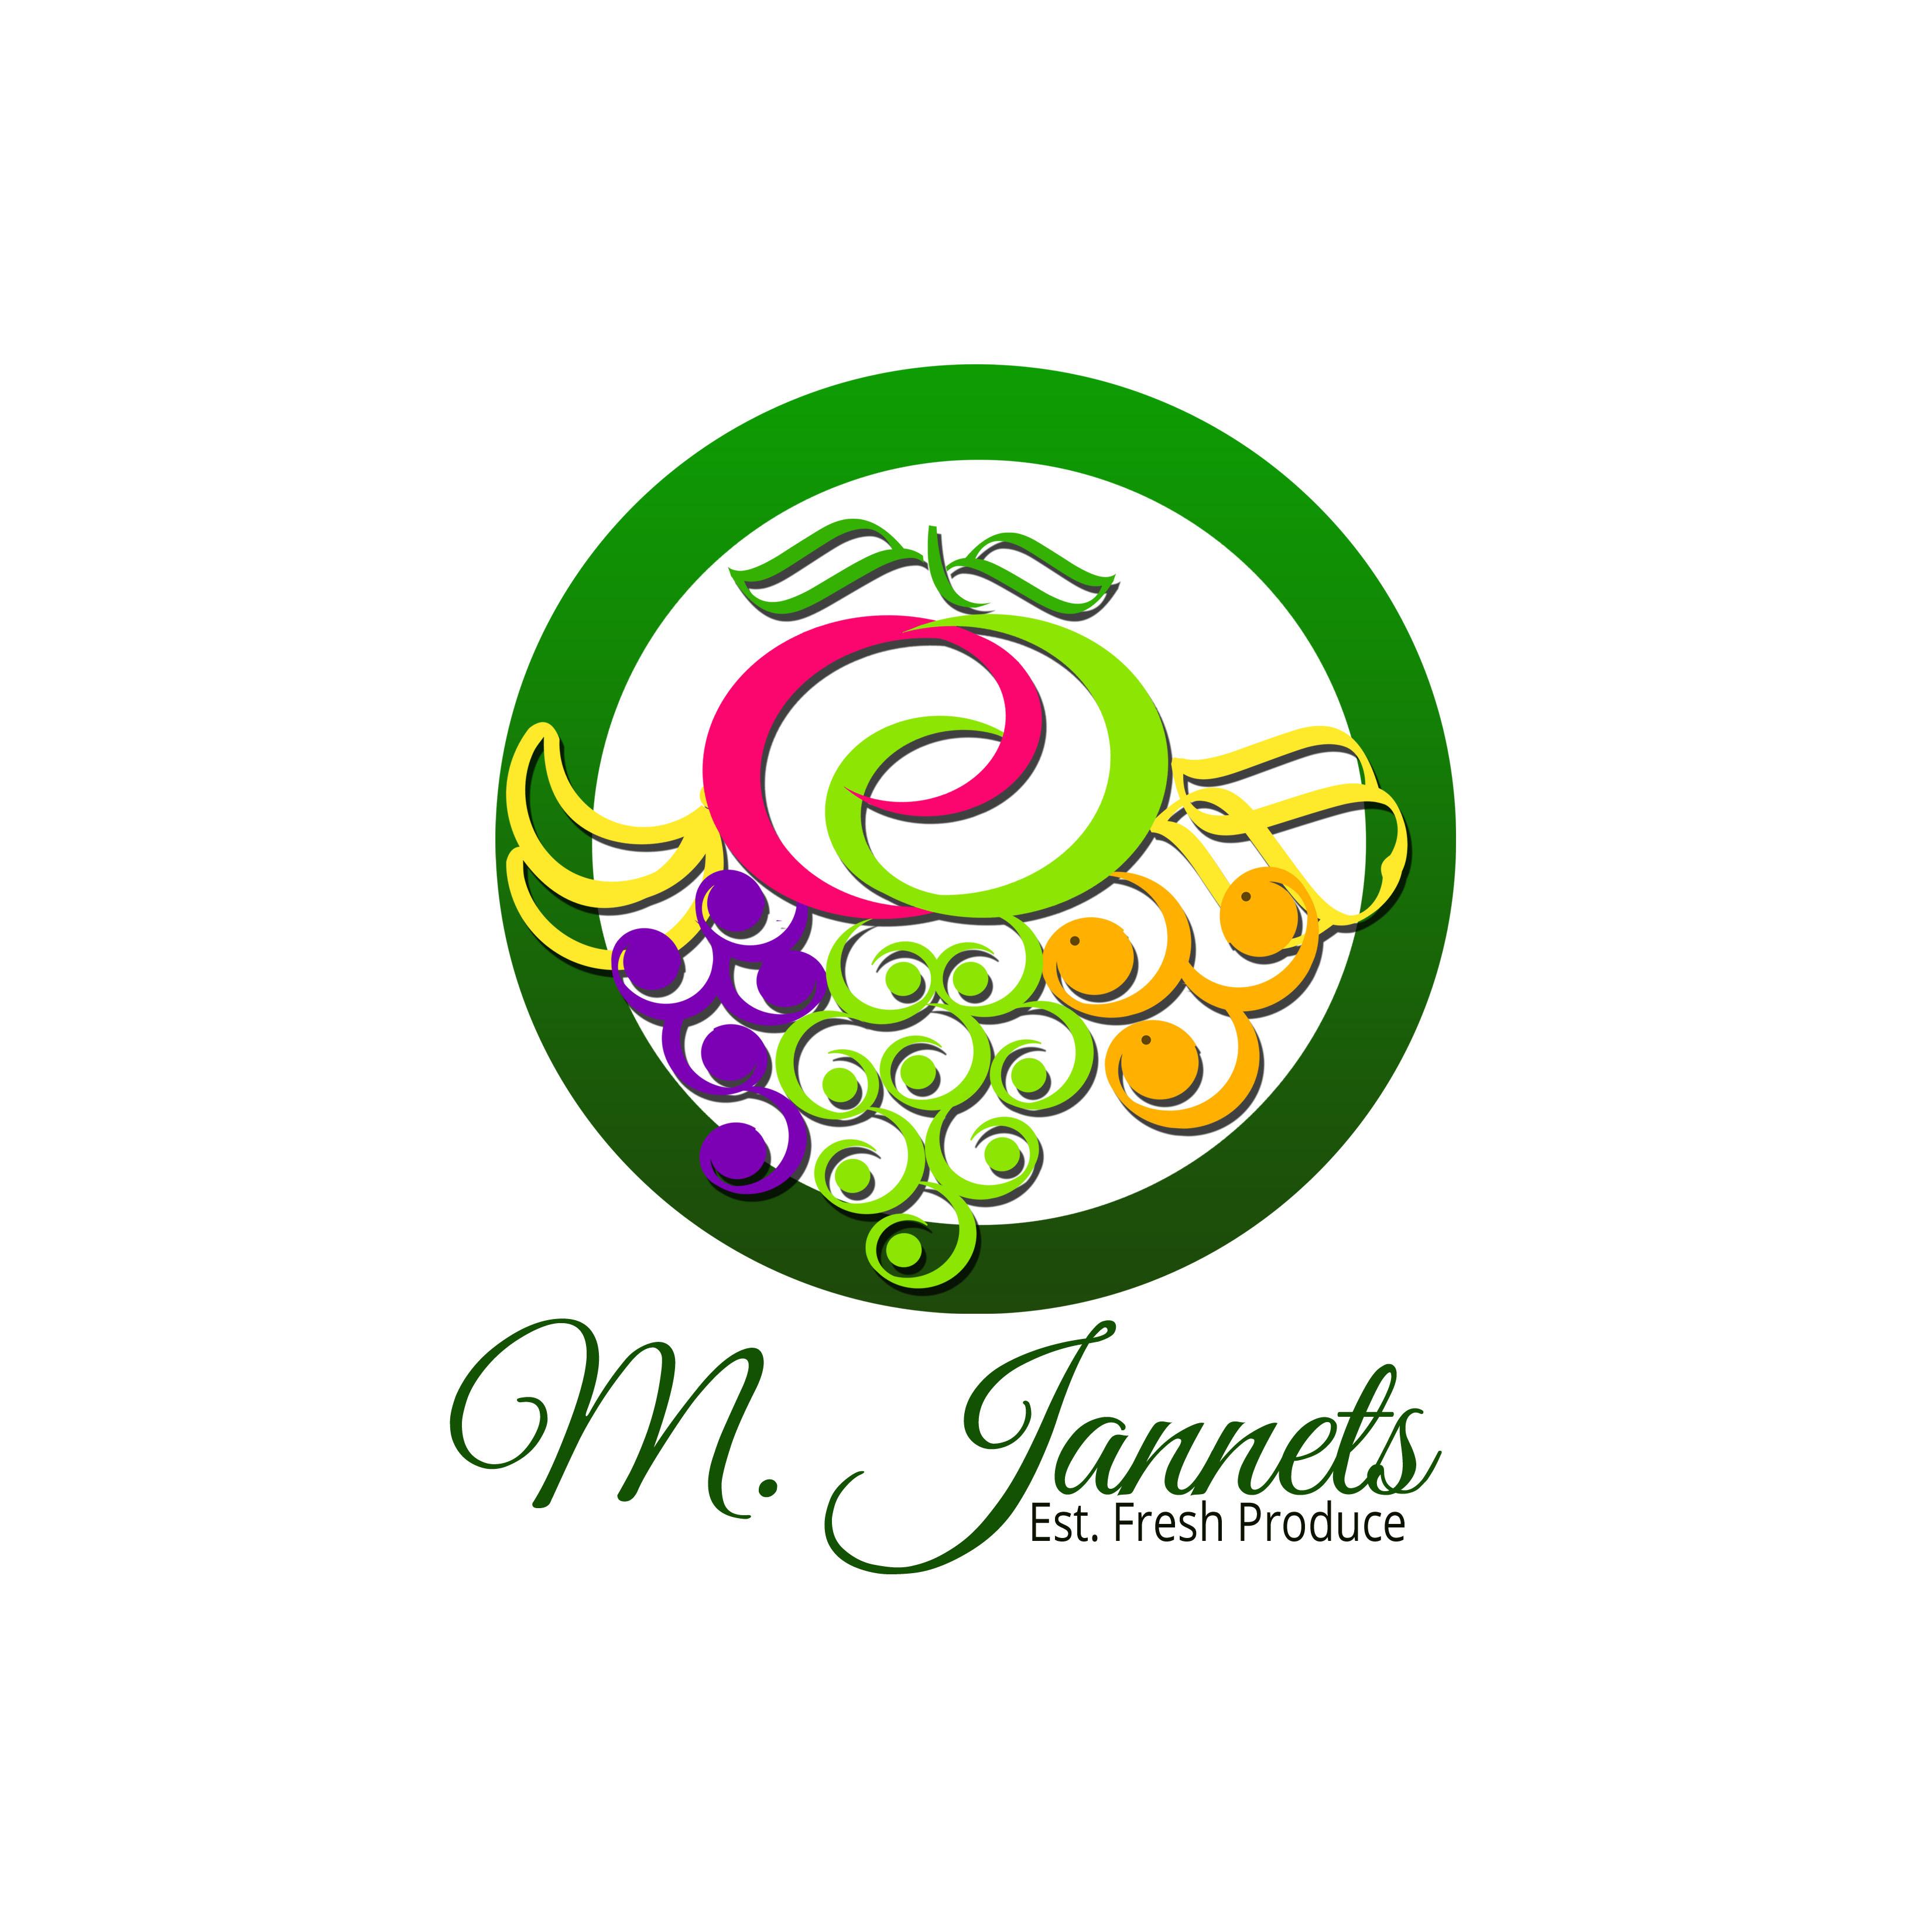 Logo Design by Allan Esclamado - Entry No. 50 in the Logo Design Contest Inspiring Logo Design for M. Jannets.